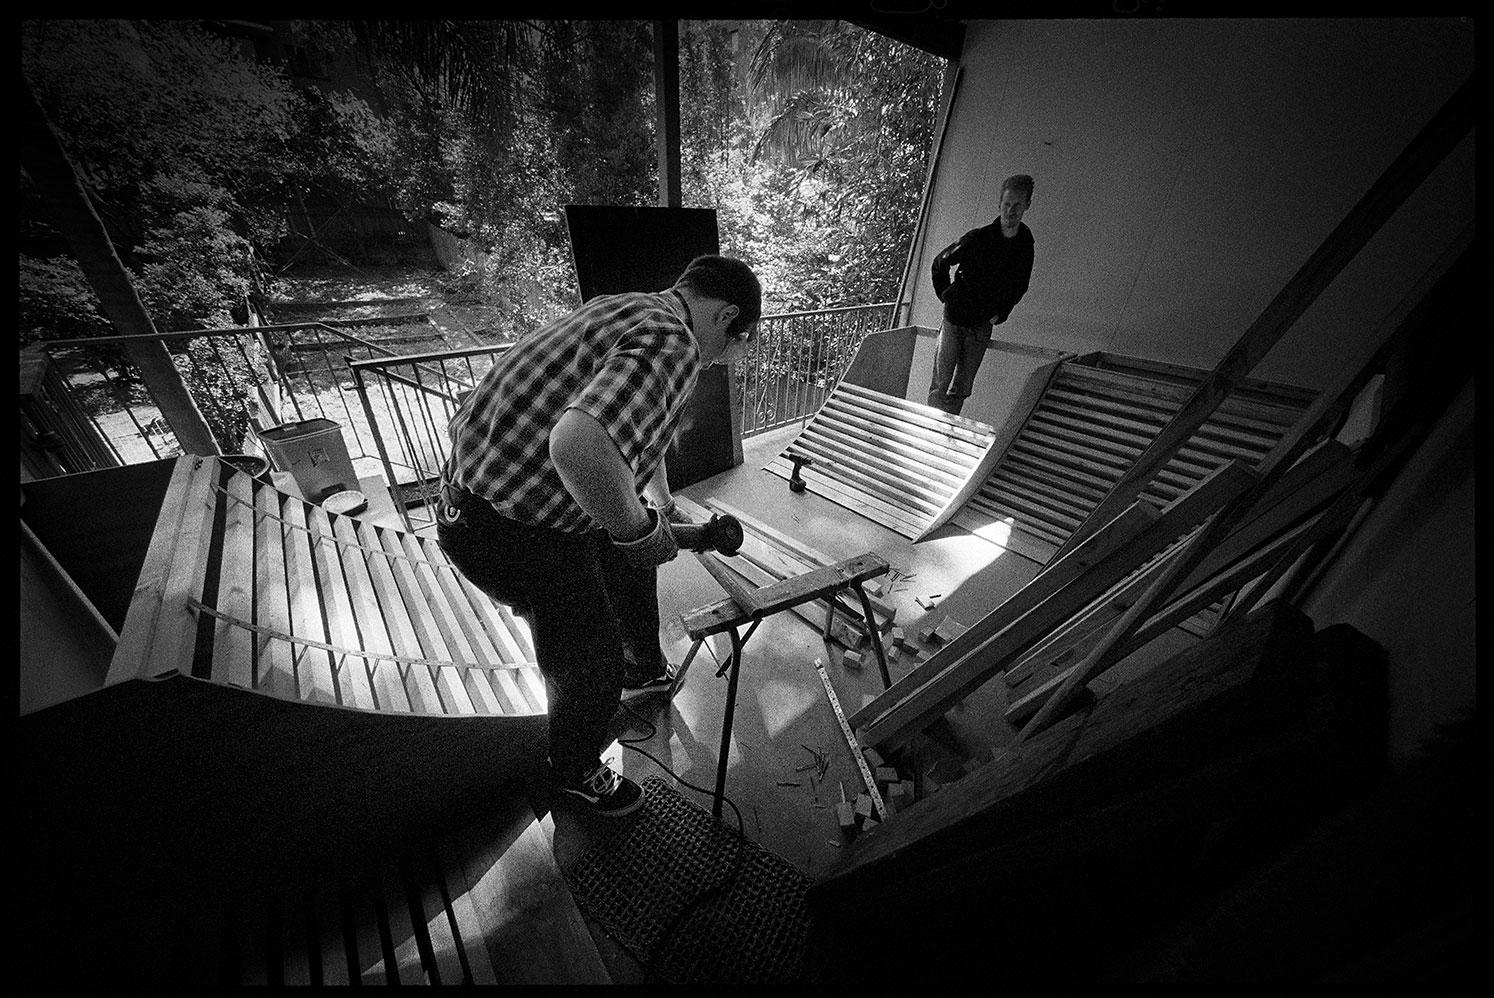 Building the Death Trap ramp, Enmore, NSW, Silver Gelatin Print, 50.8cm x 60.1cm, 1/5